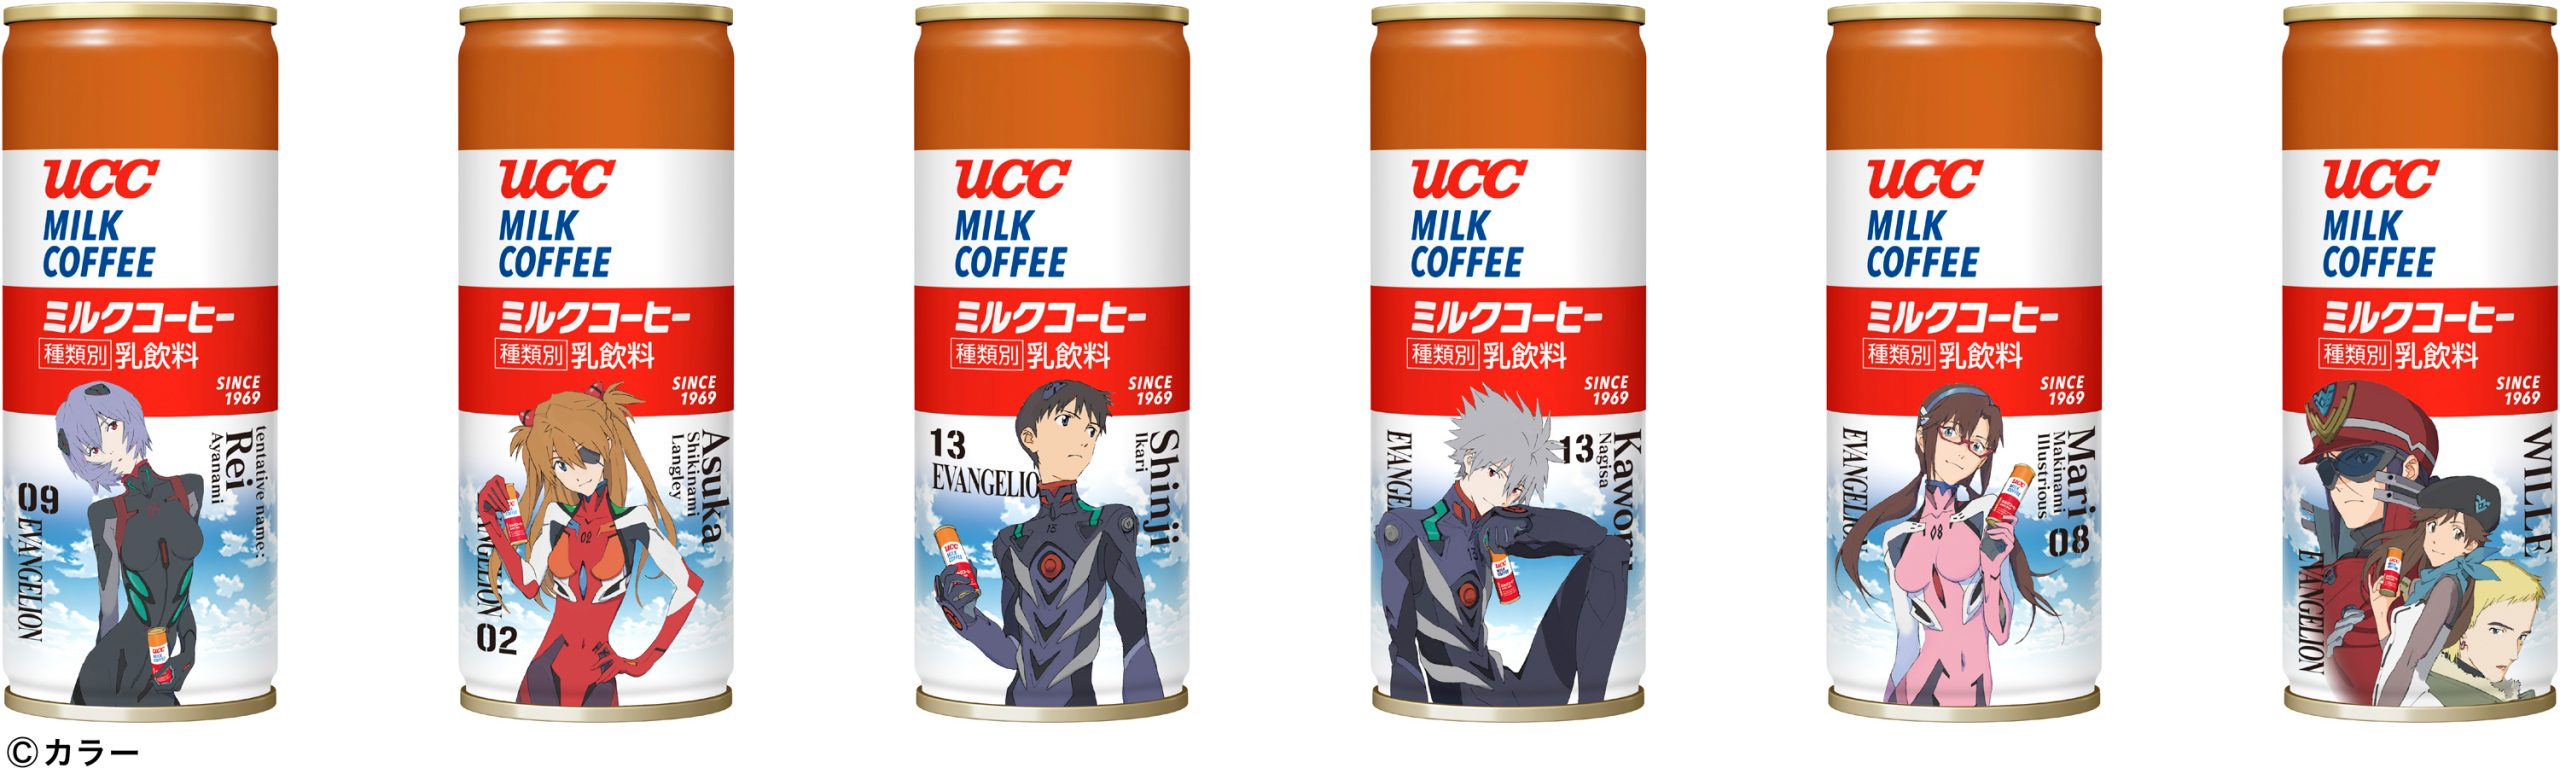 『UCC ミルクコーヒー』×『EVANGELION』限定エヴァ缶6種類